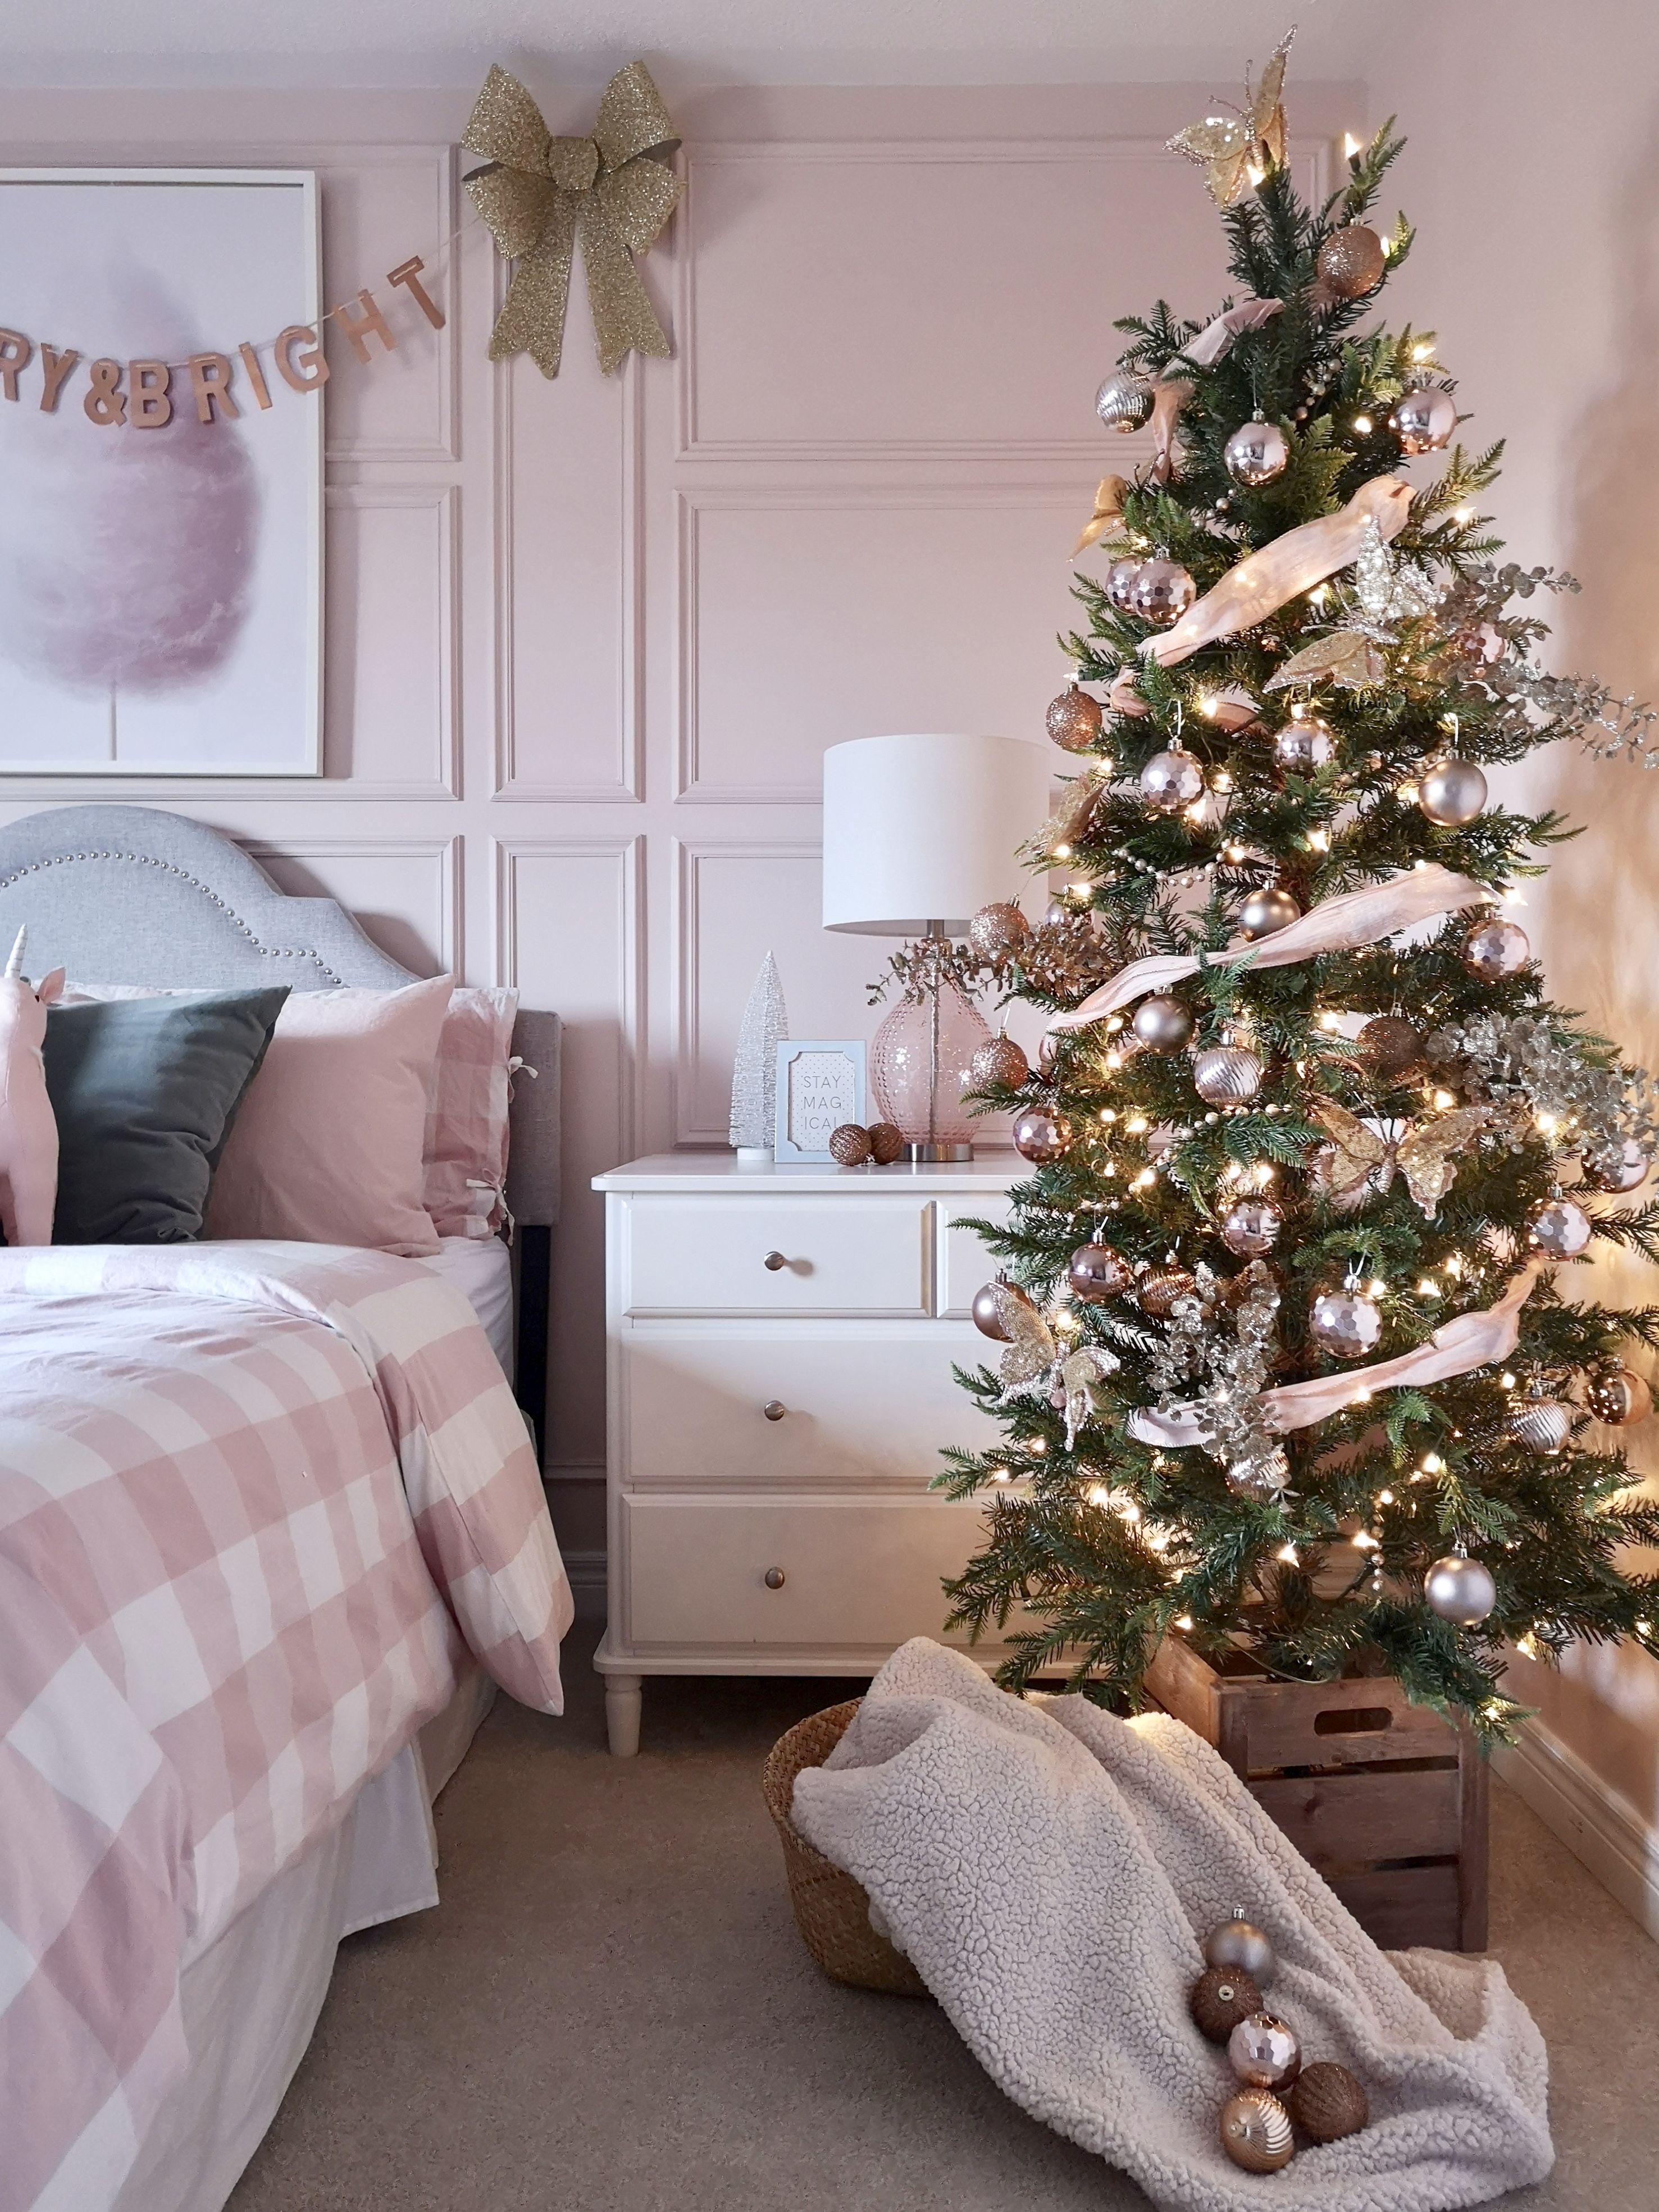 Pretty Pink Girls Christmas Room Project Nursery Christmas Decorations Bedroom Pink Christmas Bedroom Pink Christmas Tree Decorations The girls christmas bedroom